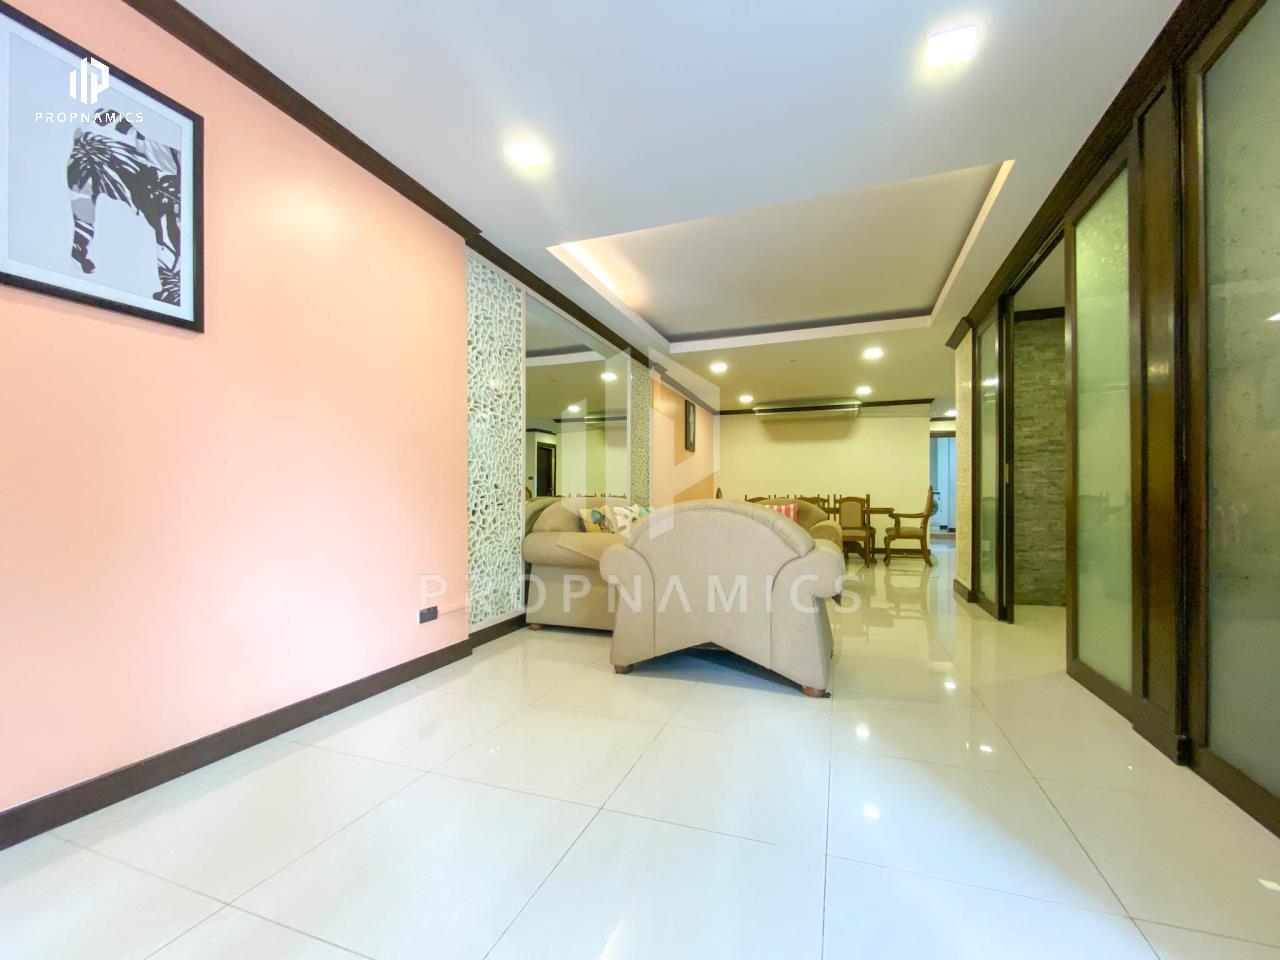 Propnamics Co., Ltd Agency's FOR RENT: SINGLE HOUSE IN SUKHUMVIT 26 6